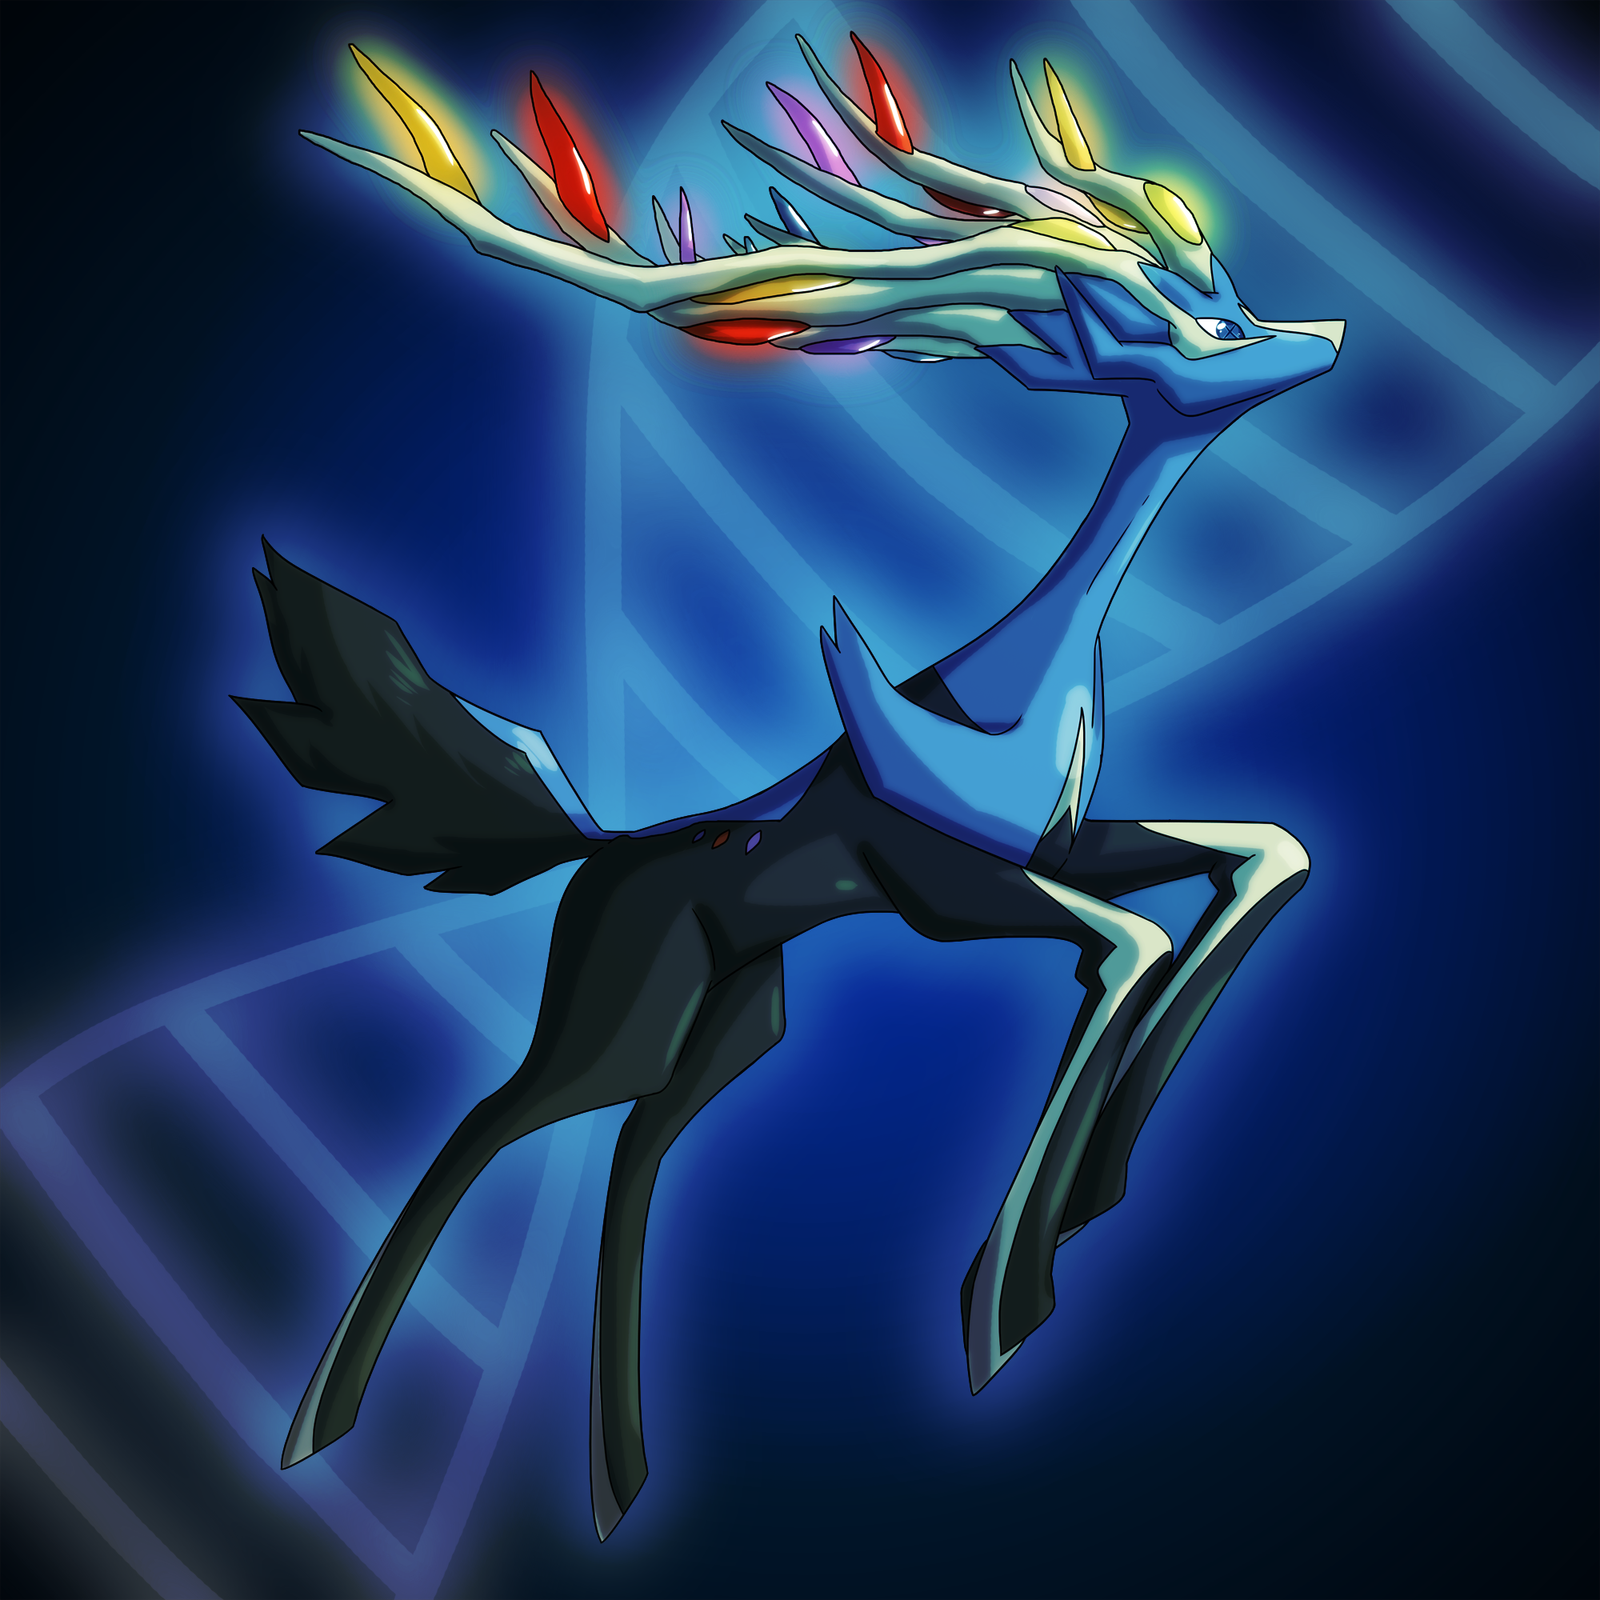 Pokemon X: Xerneas by MTC-Studio on DeviantArt